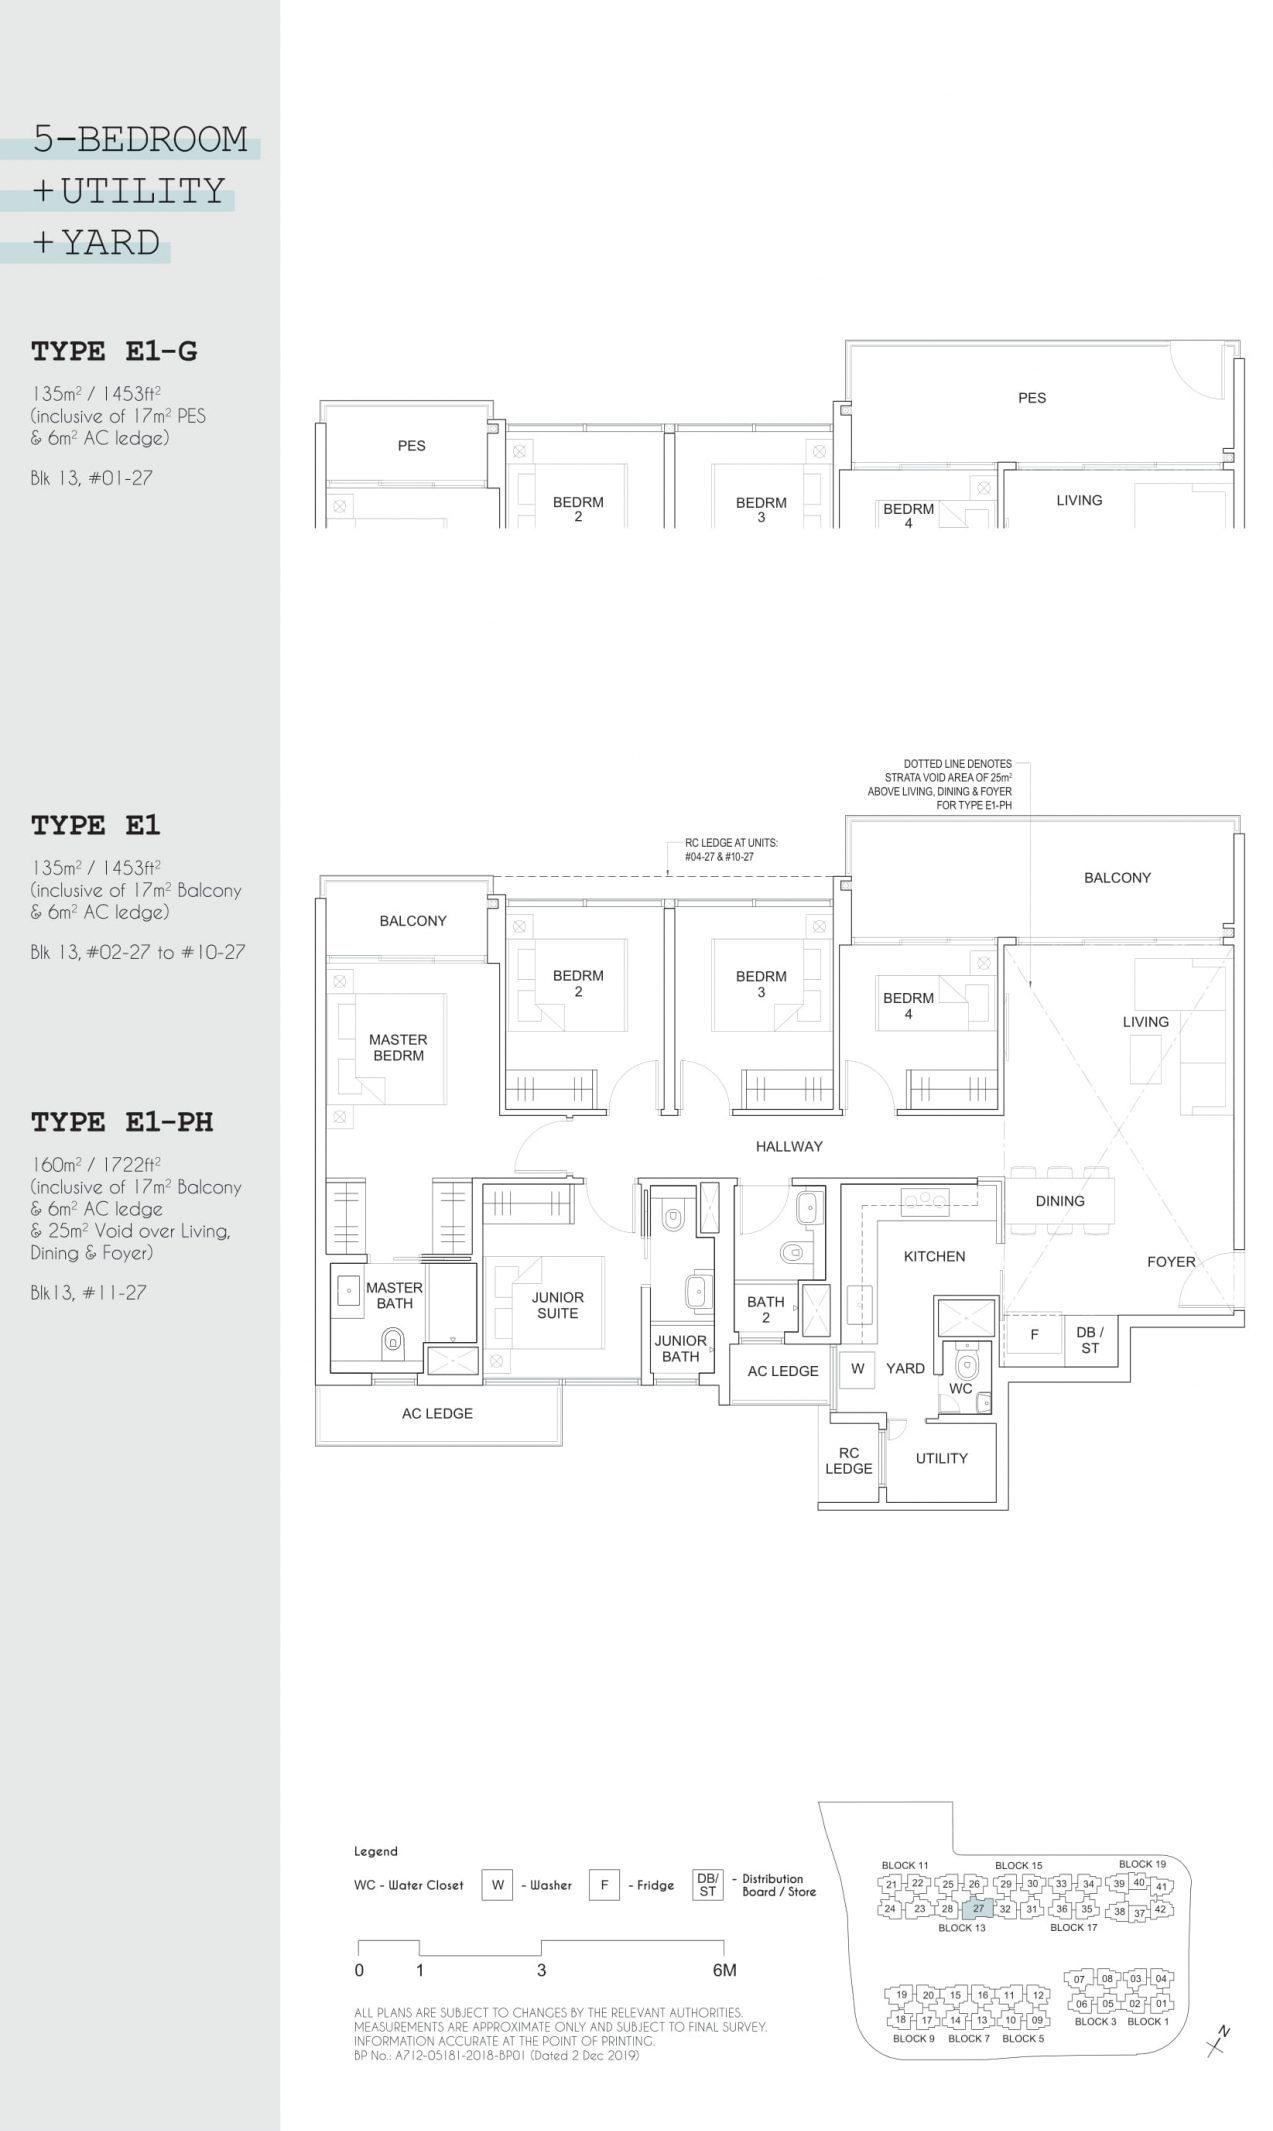 Parc Canberra EC's five-bedroom + utility + yard types